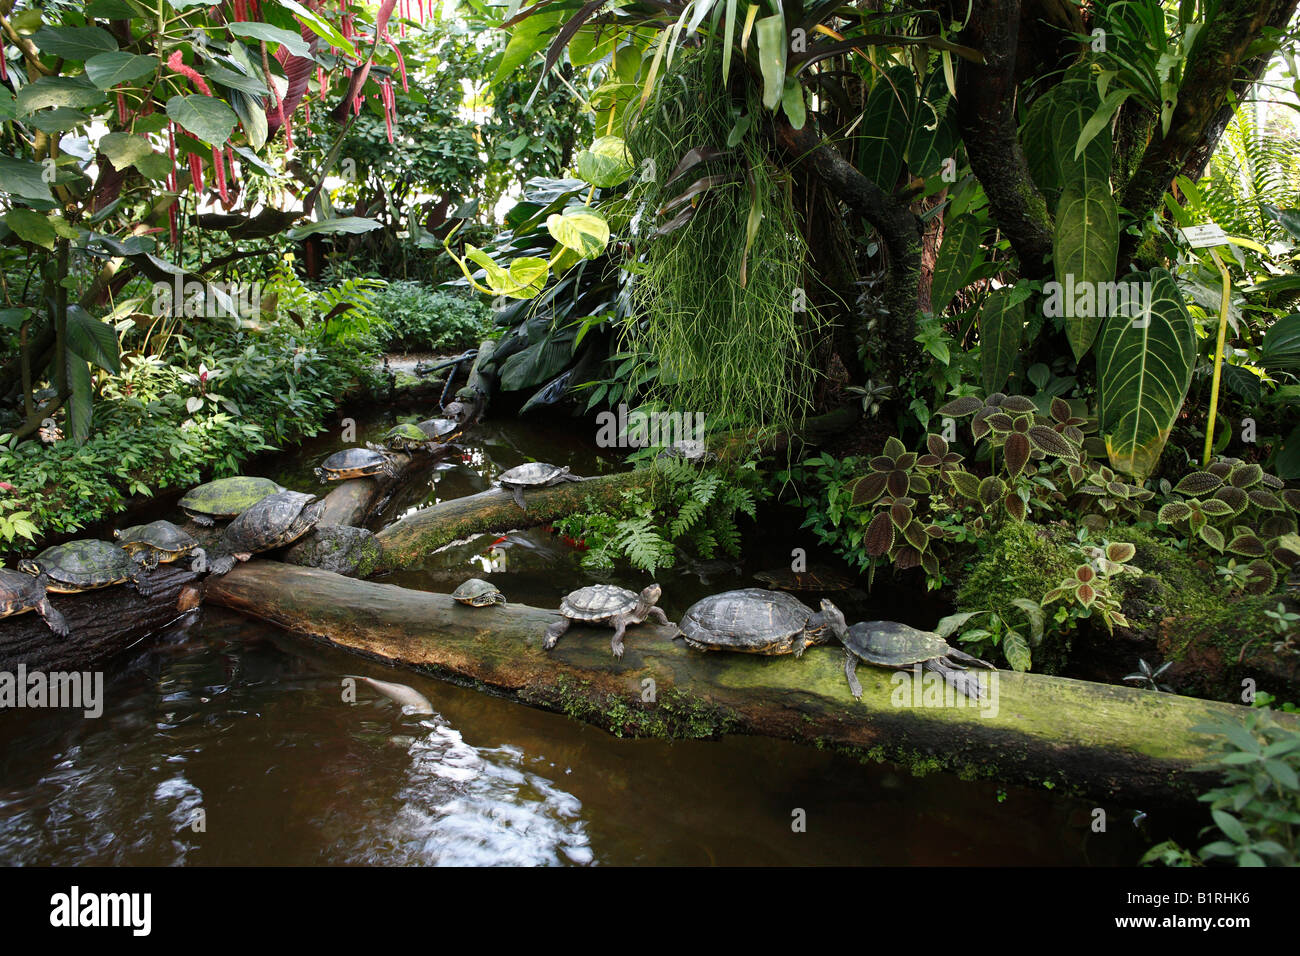 Turtles in the hothouse, Botanic Garden, Munich, Upper Bavaria, Germany, Europe - Stock Image